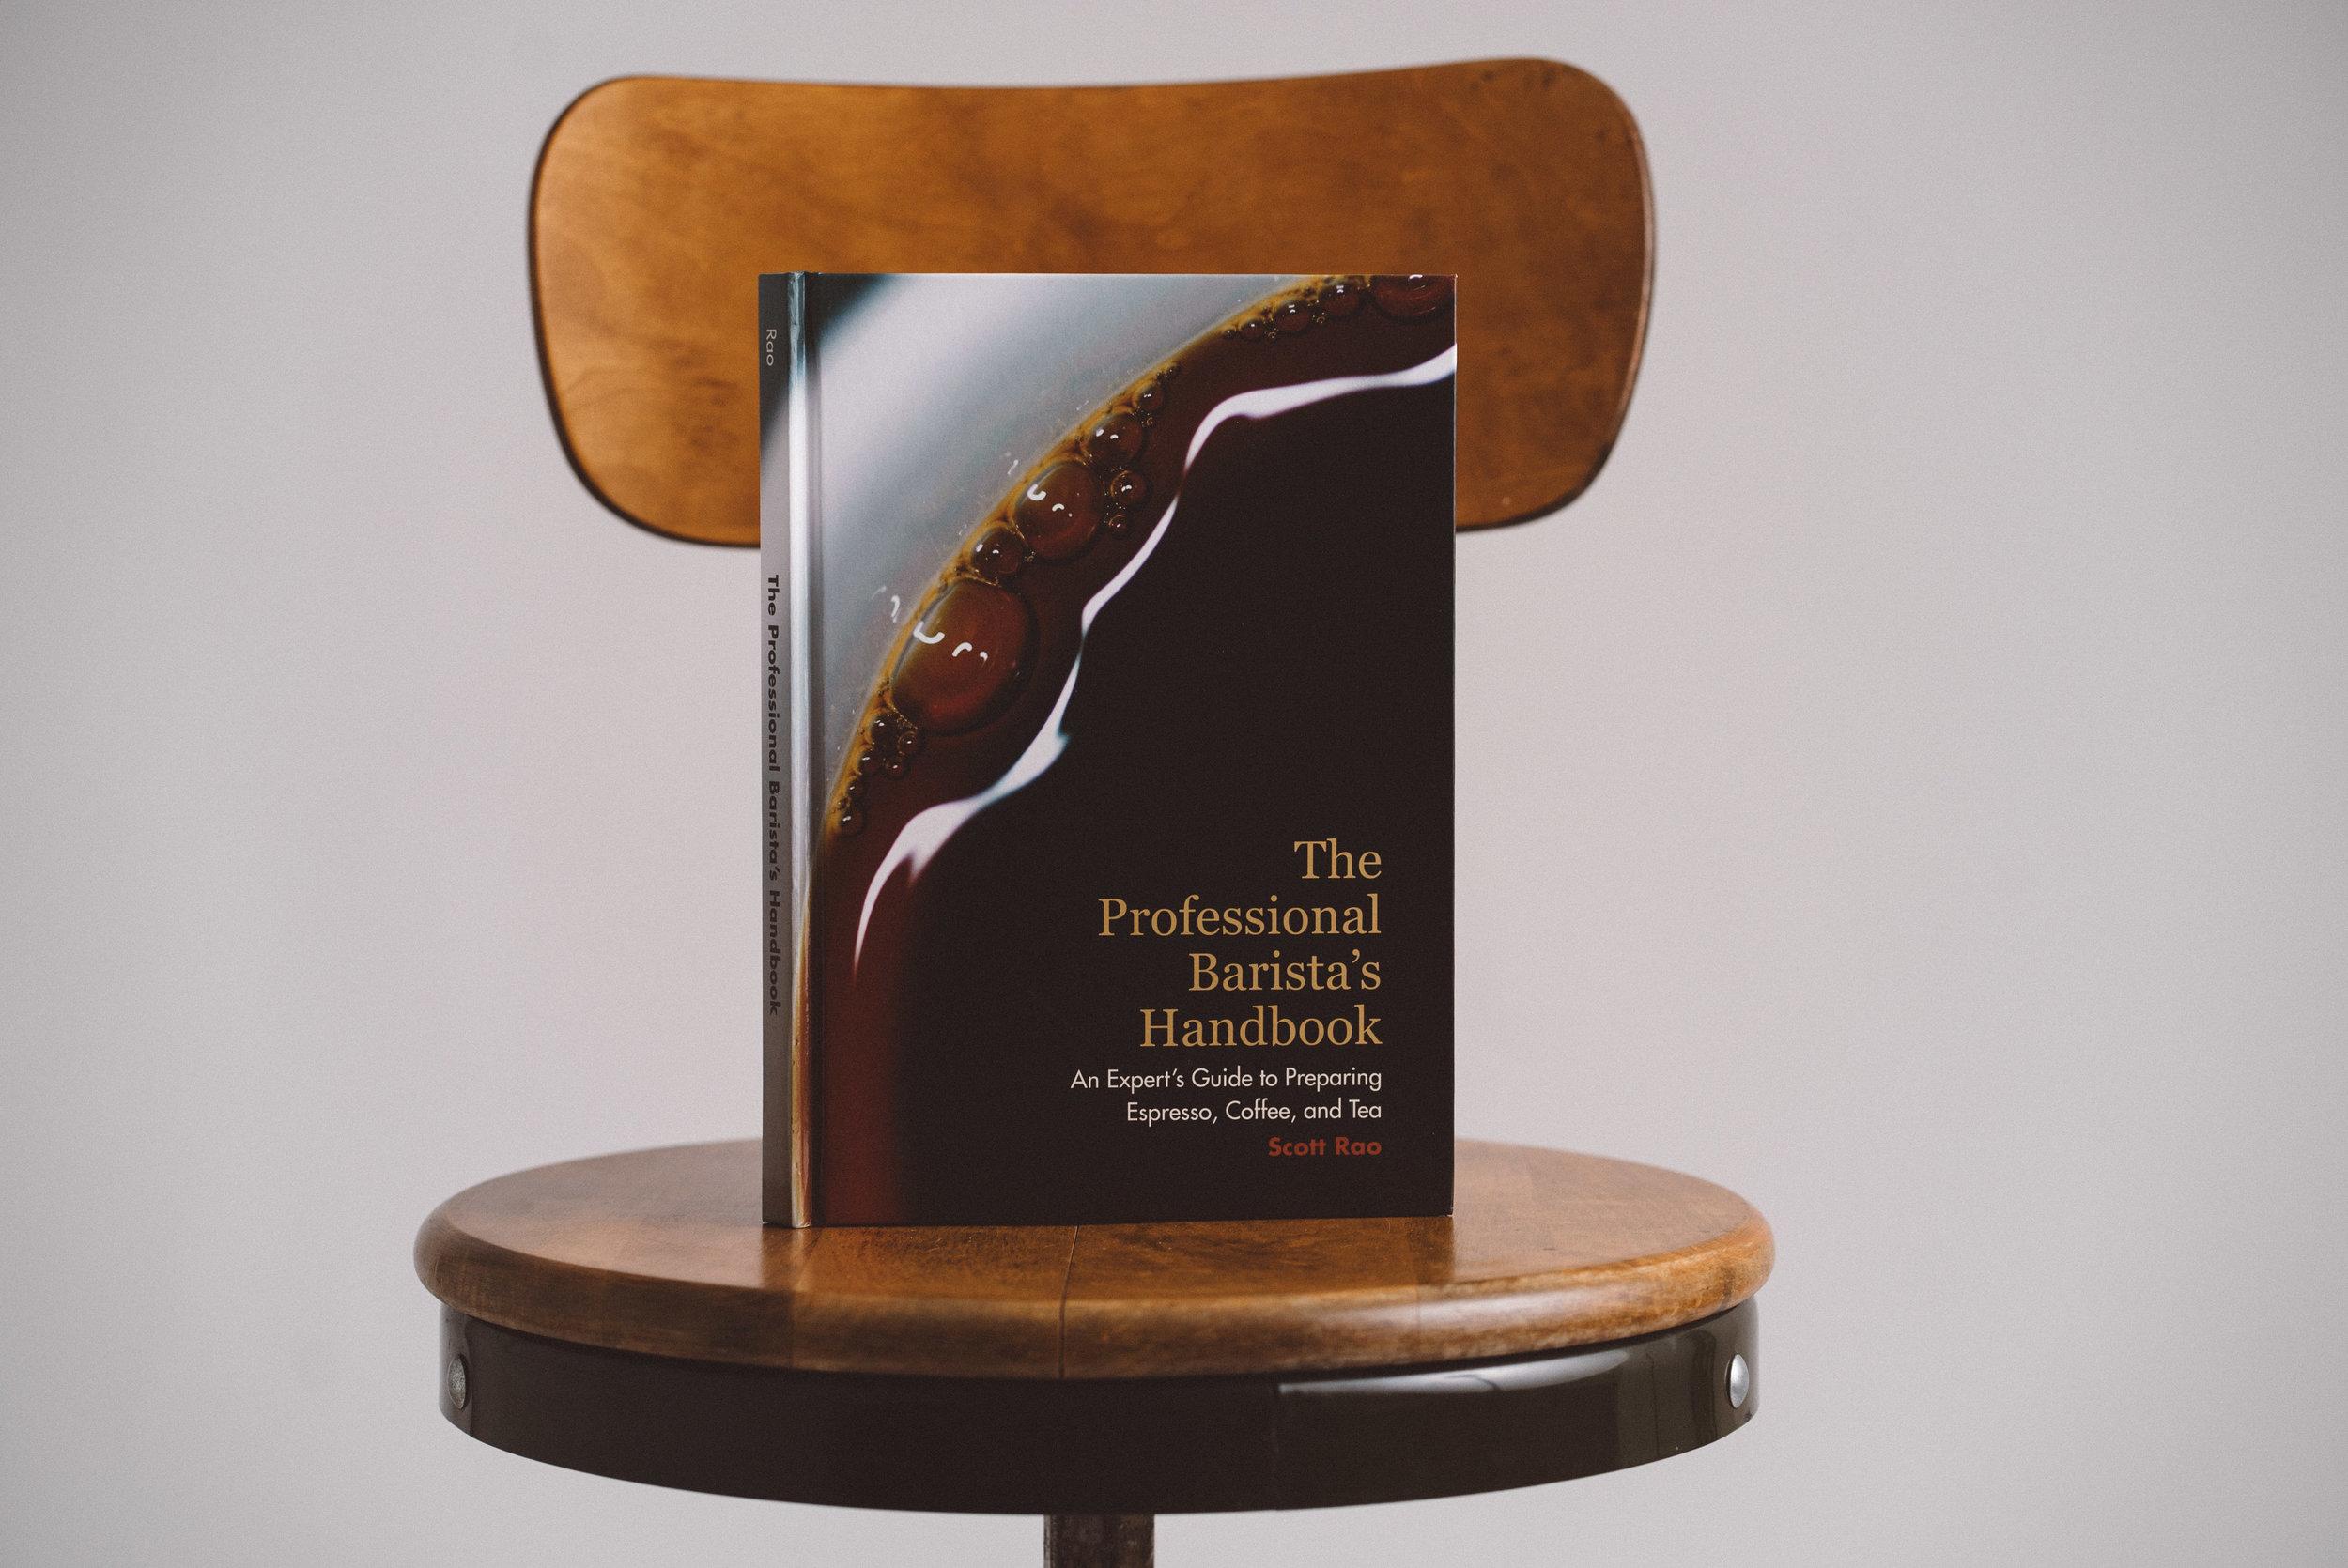 The Professional Barista's Handbook Cover